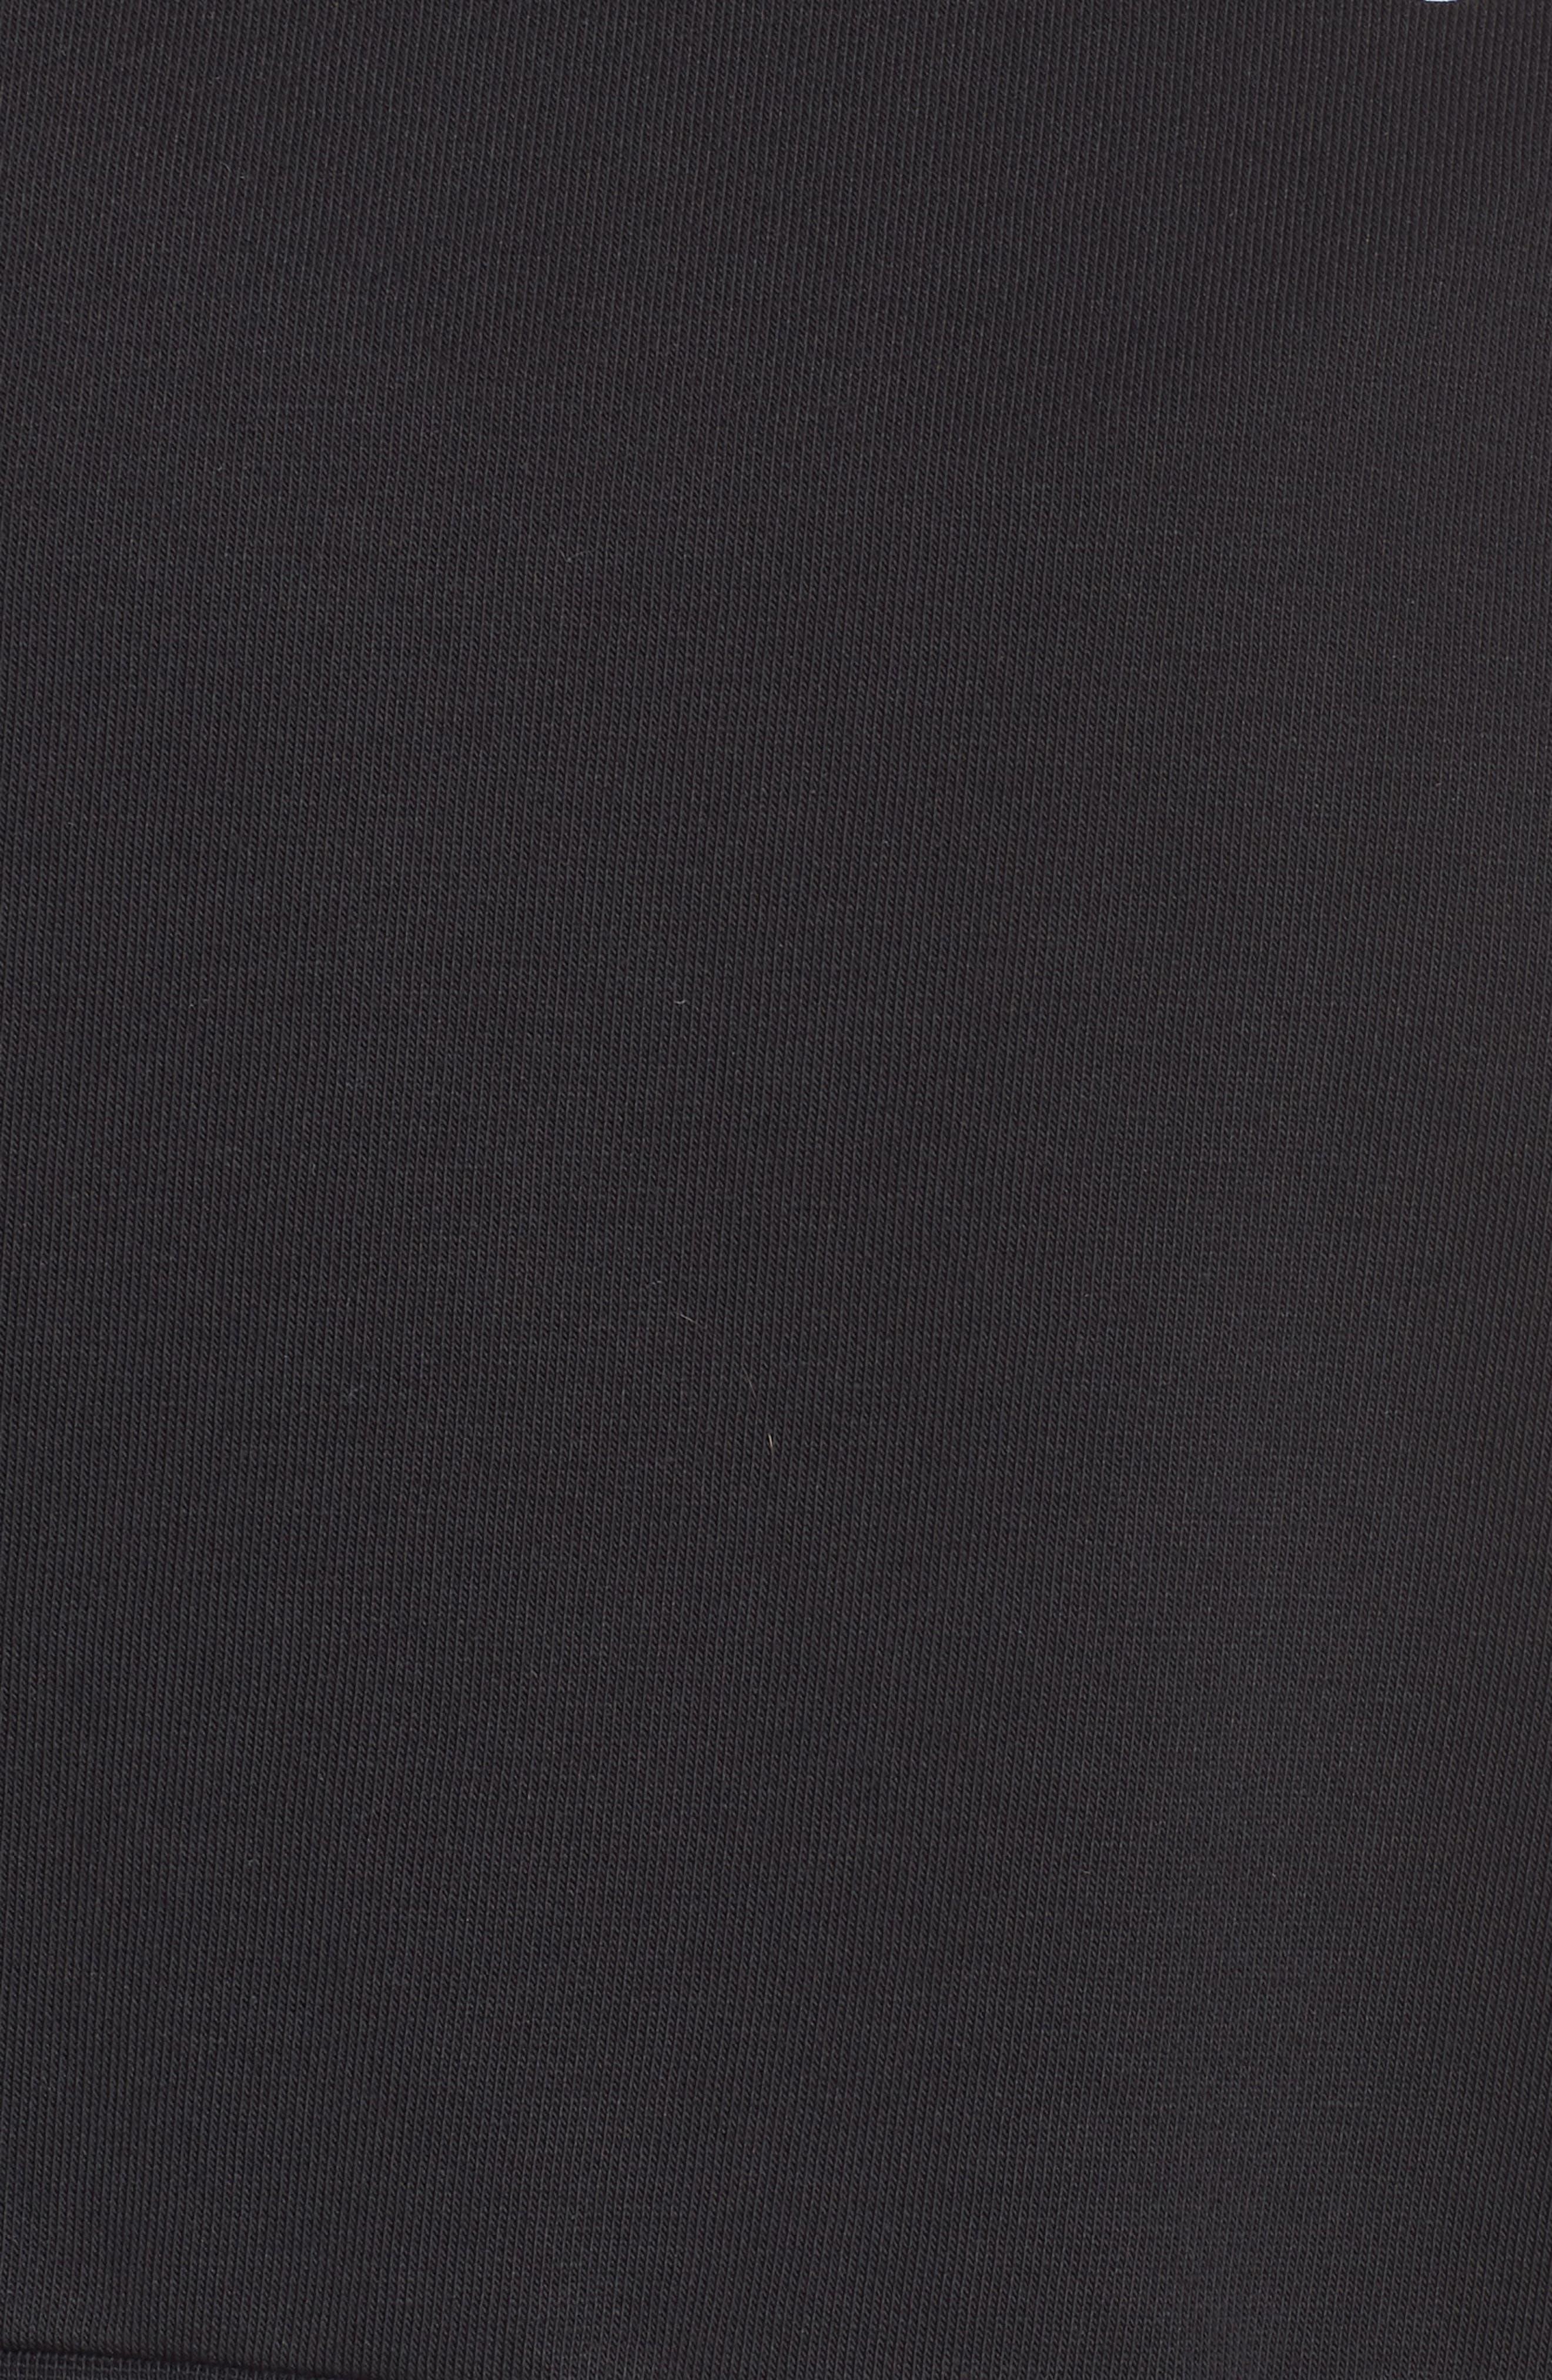 NIKE, Dry Cropped Training Sweatshirt, Alternate thumbnail 6, color, BLACK/ WHITE